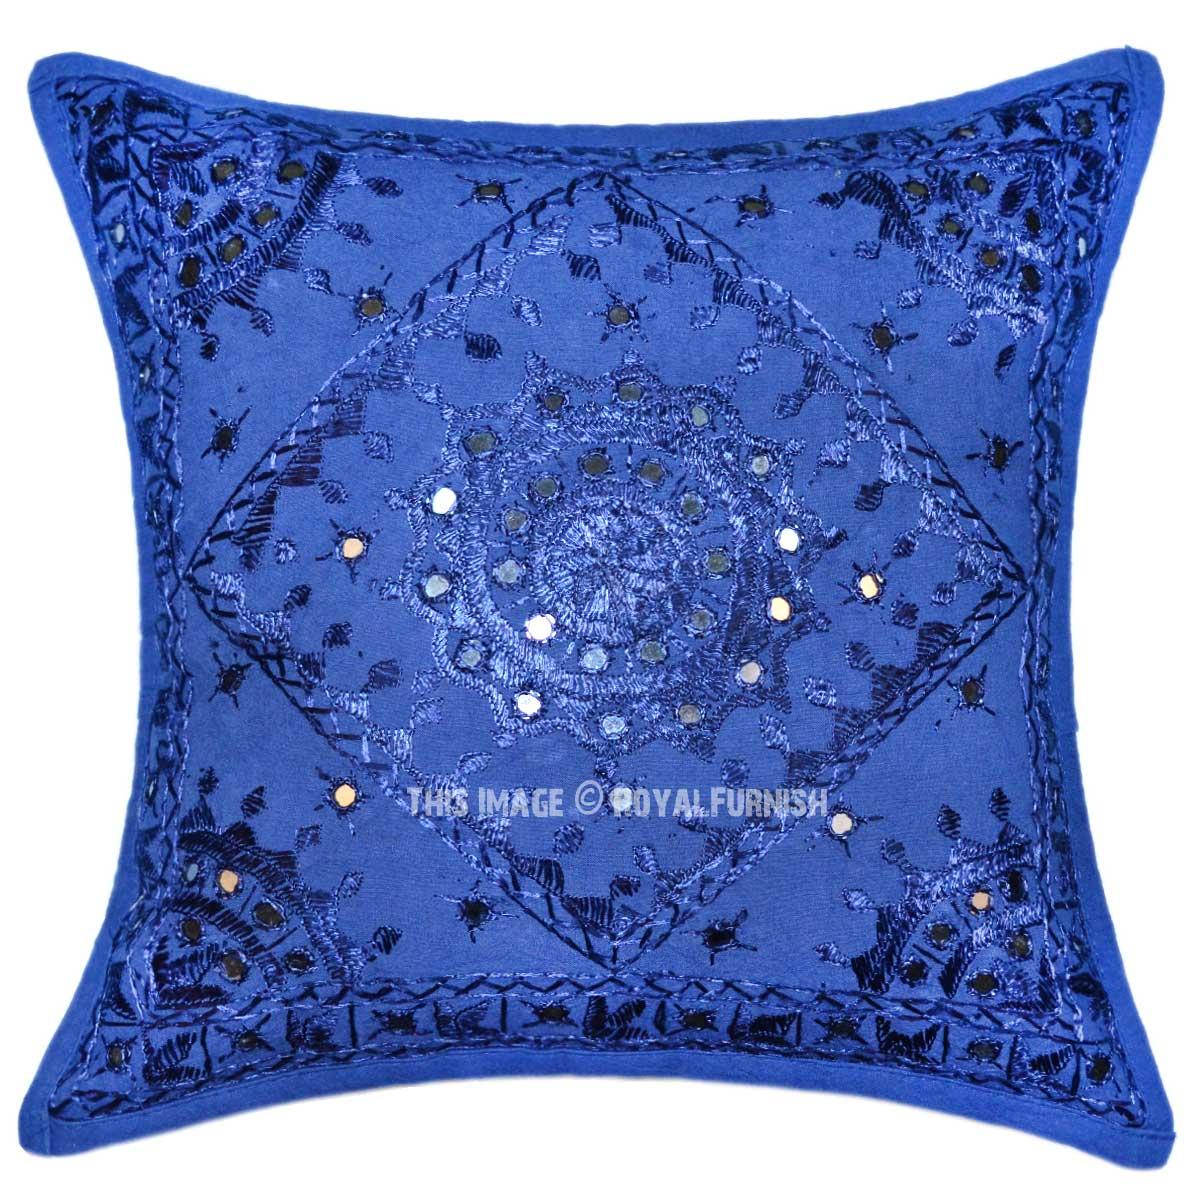 Blue Boho Accent 16X16 Decorative Mirrored Cotton Throw